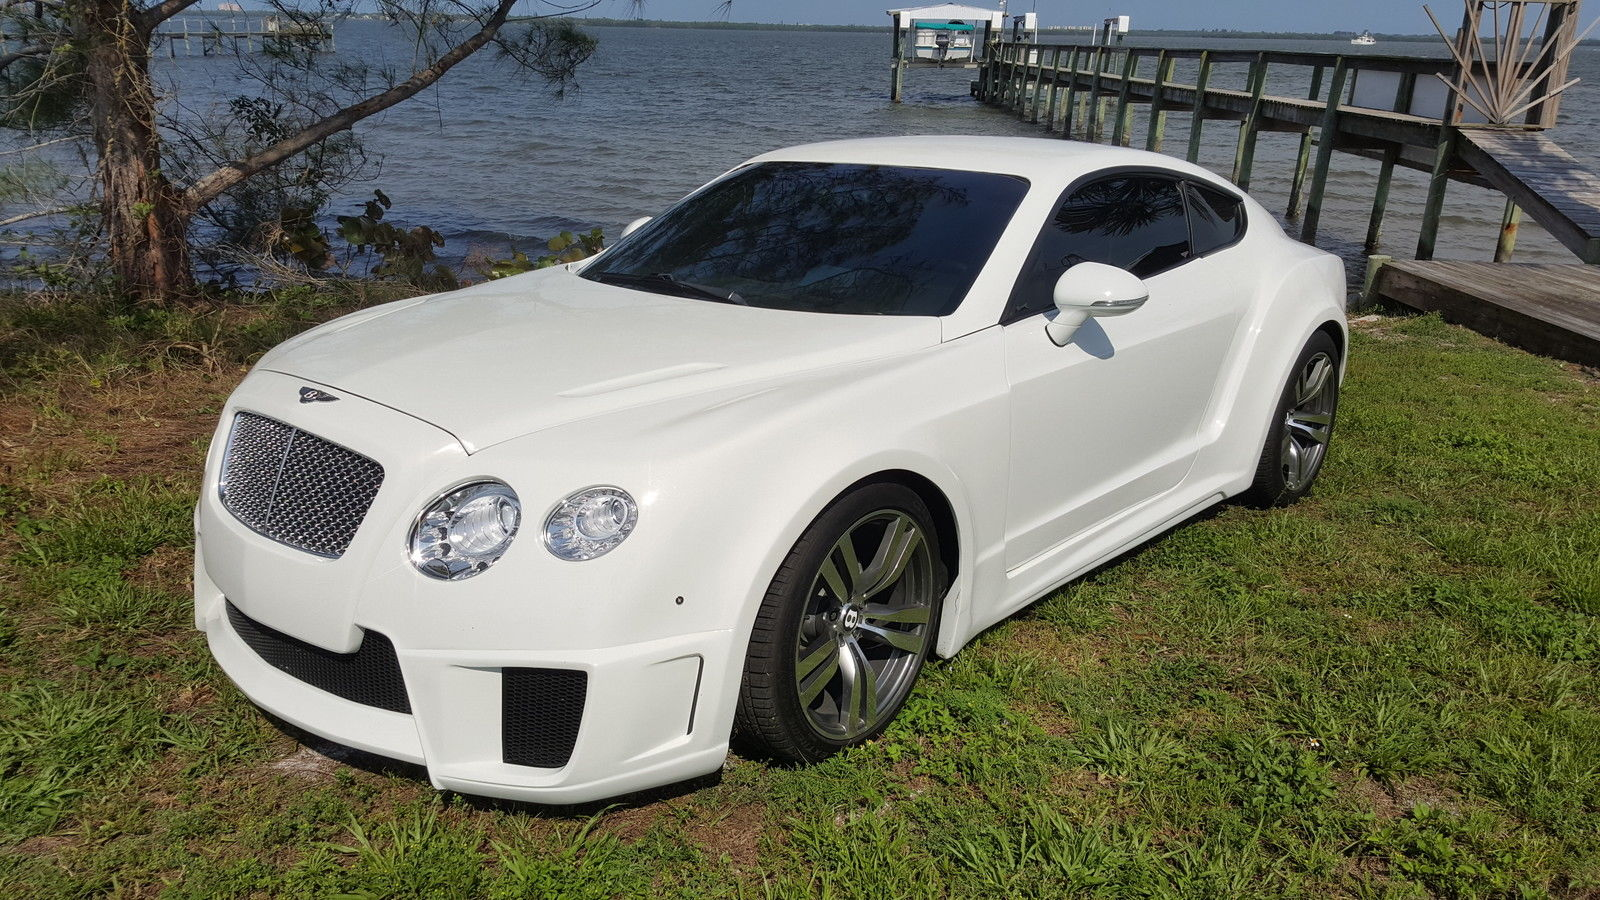 Widebody Hardtop Bentley Coupe GT 2016 Replica for sale